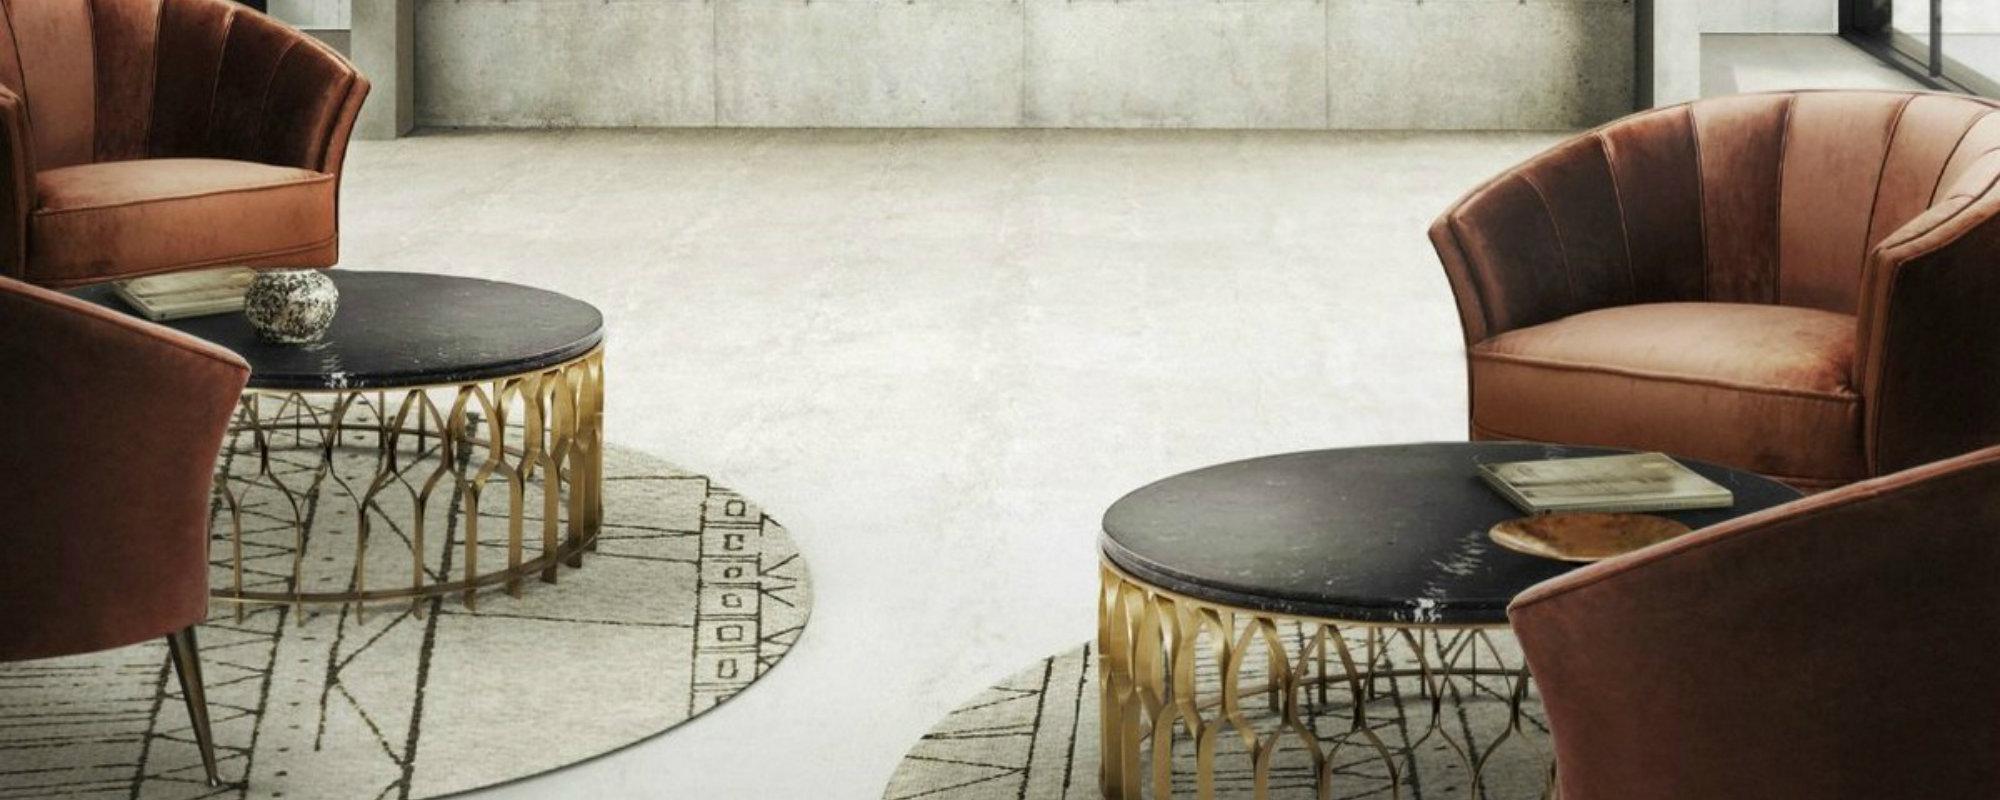 Ideas para Decorar: Mesas de Centro de lujo modernas para proyectos ideas para decorar Ideas para Decorar: Mesas de Centro de lujo modernas para proyectos Featured1 1